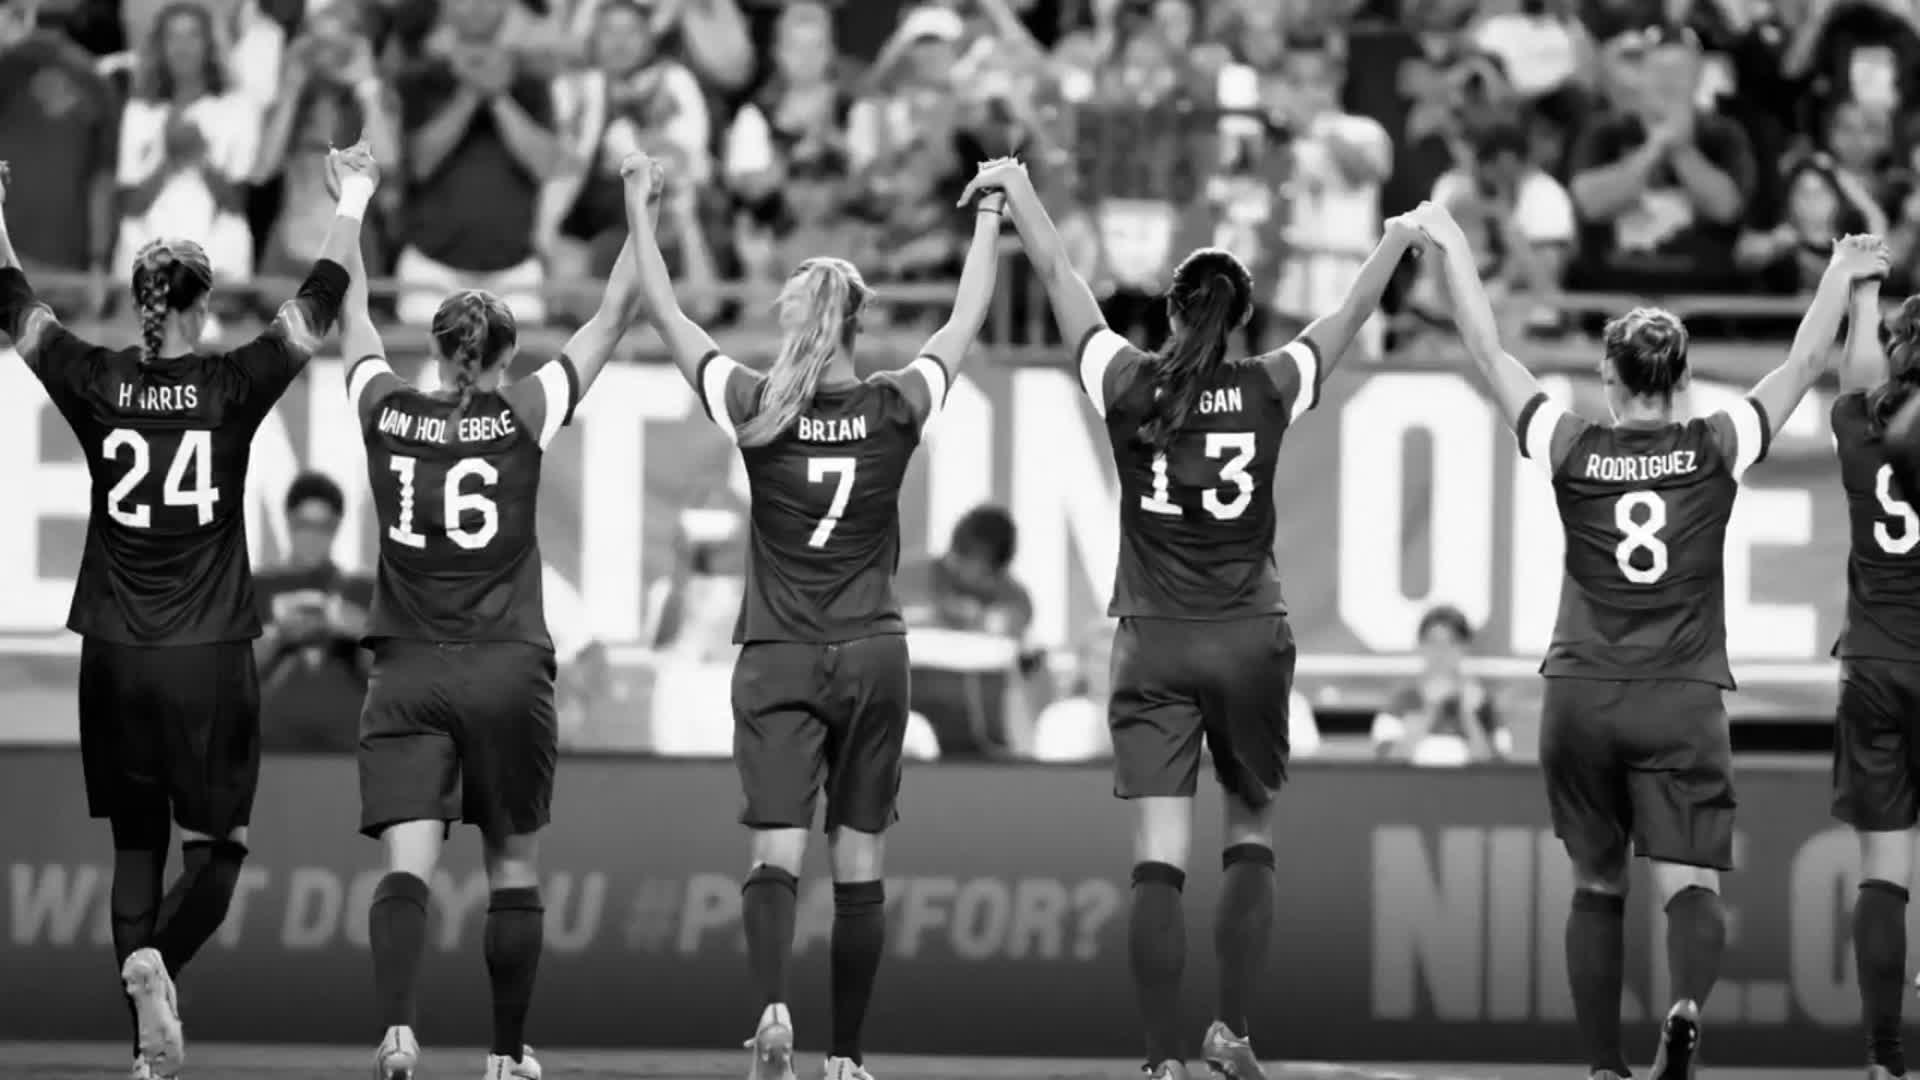 pastor Fielmente Molester  Watch the Nike ad starring the US women's soccer team - CNN Video